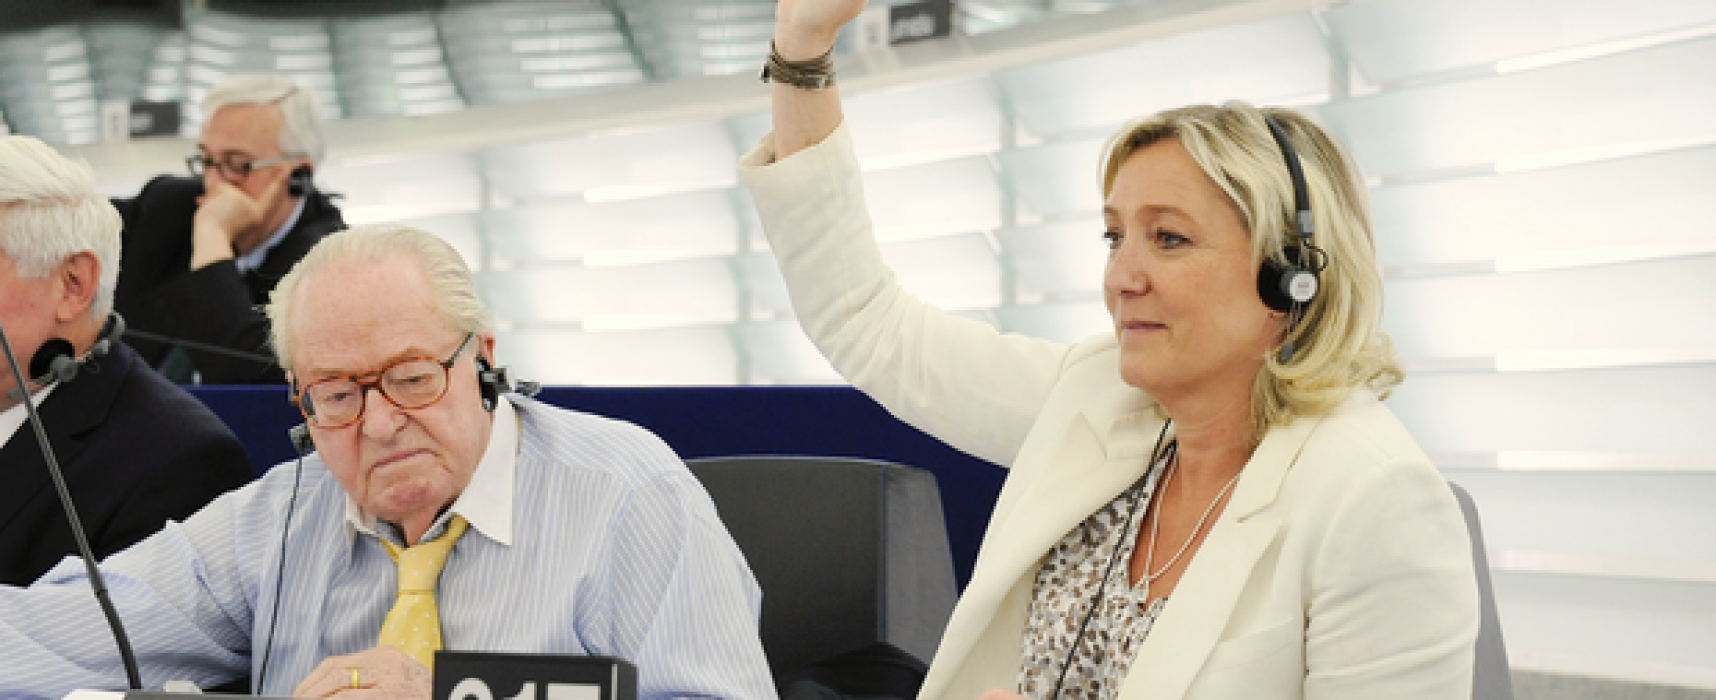 Le Pen borrowed €9 mln from Kremlin-linked bank